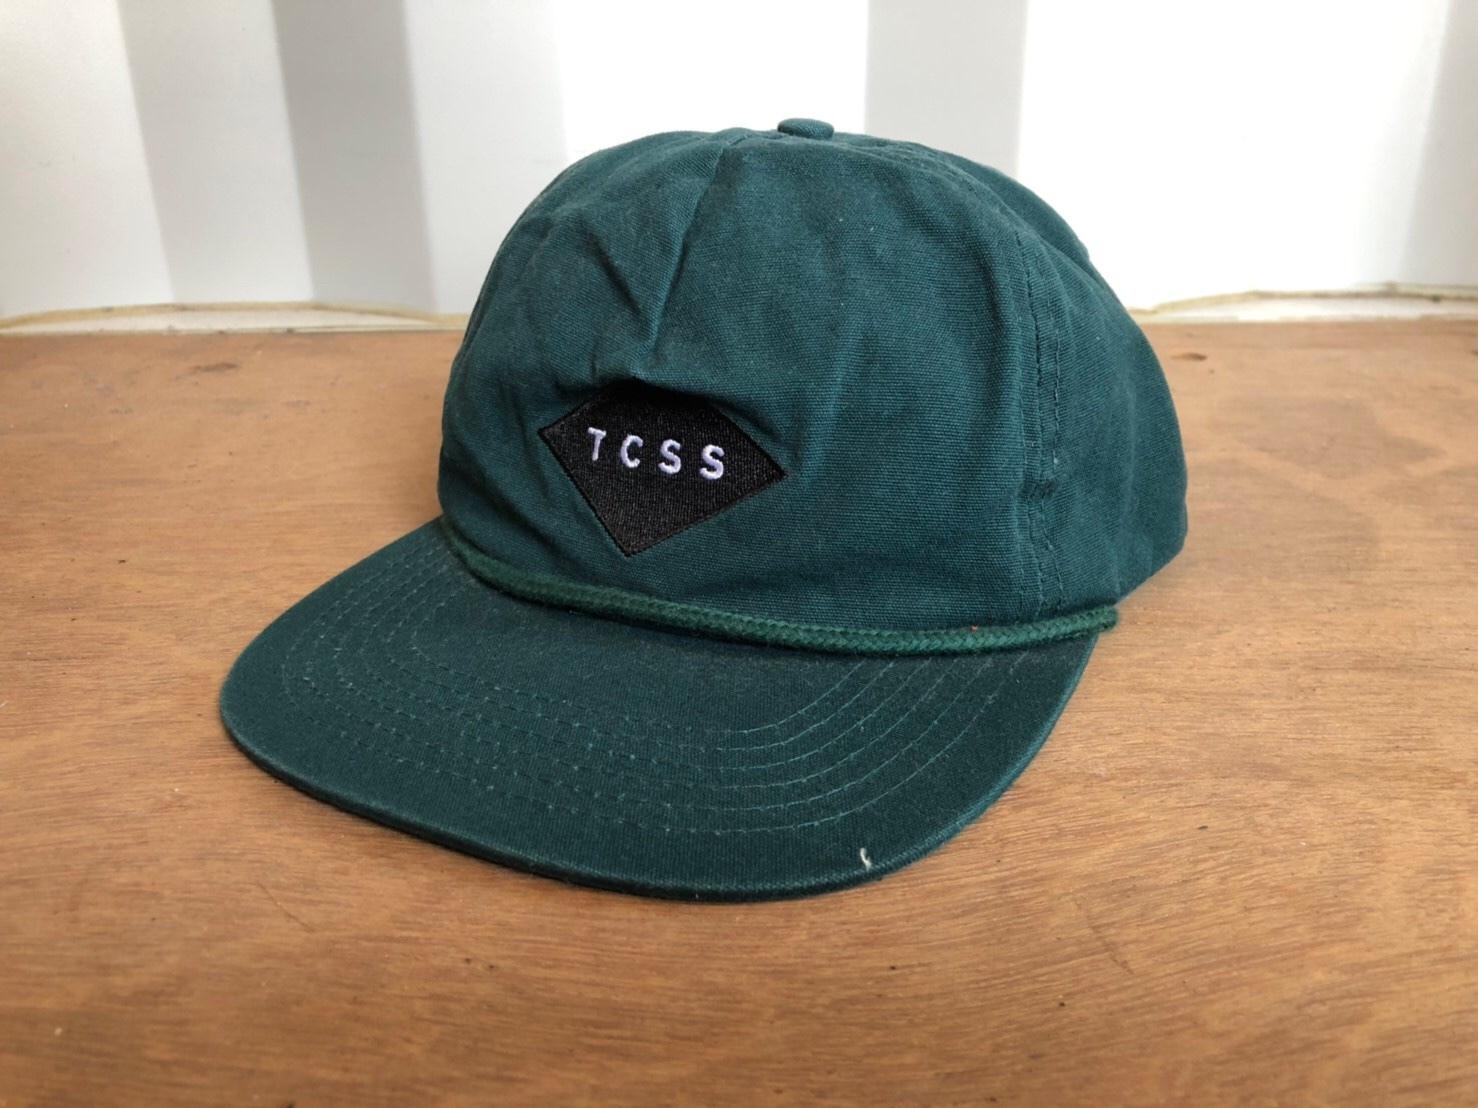 TCSS CAP (green)